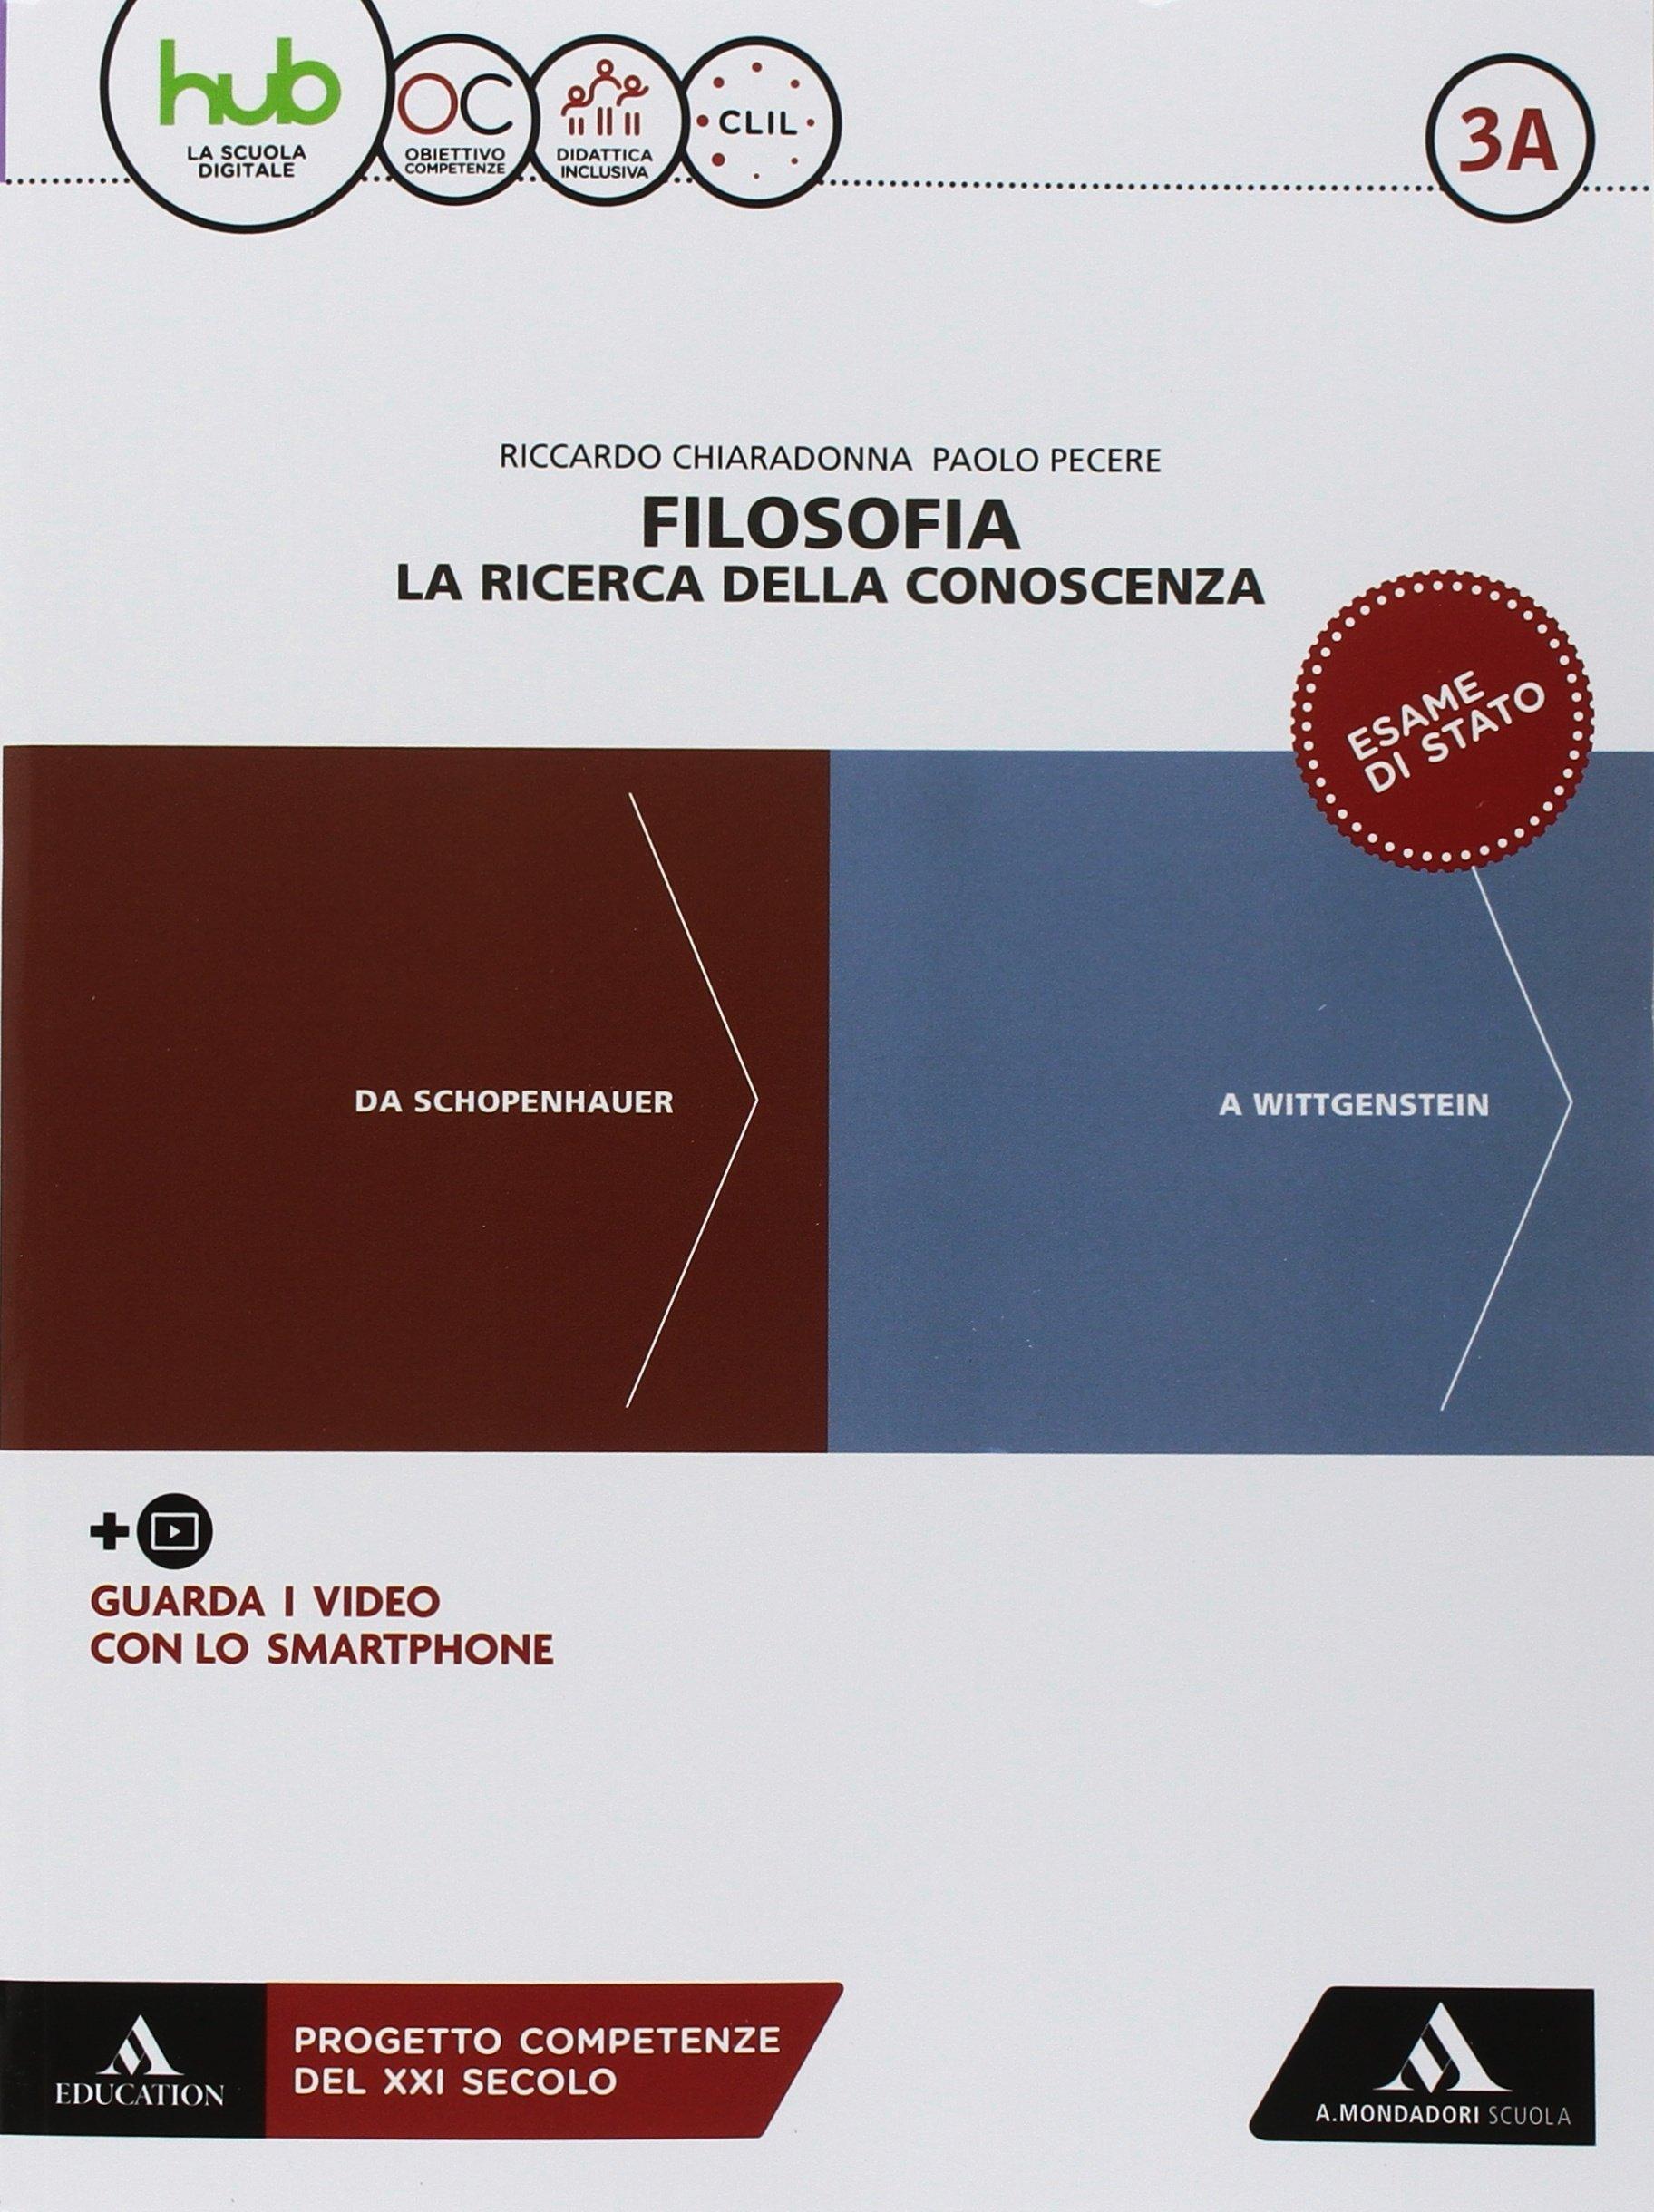 Con Libro: Filosofia per tutti: 3A-3B: Amazon.es: Riccardo Chiaradonna, Paolo Pecere: Libros en idiomas extranjeros